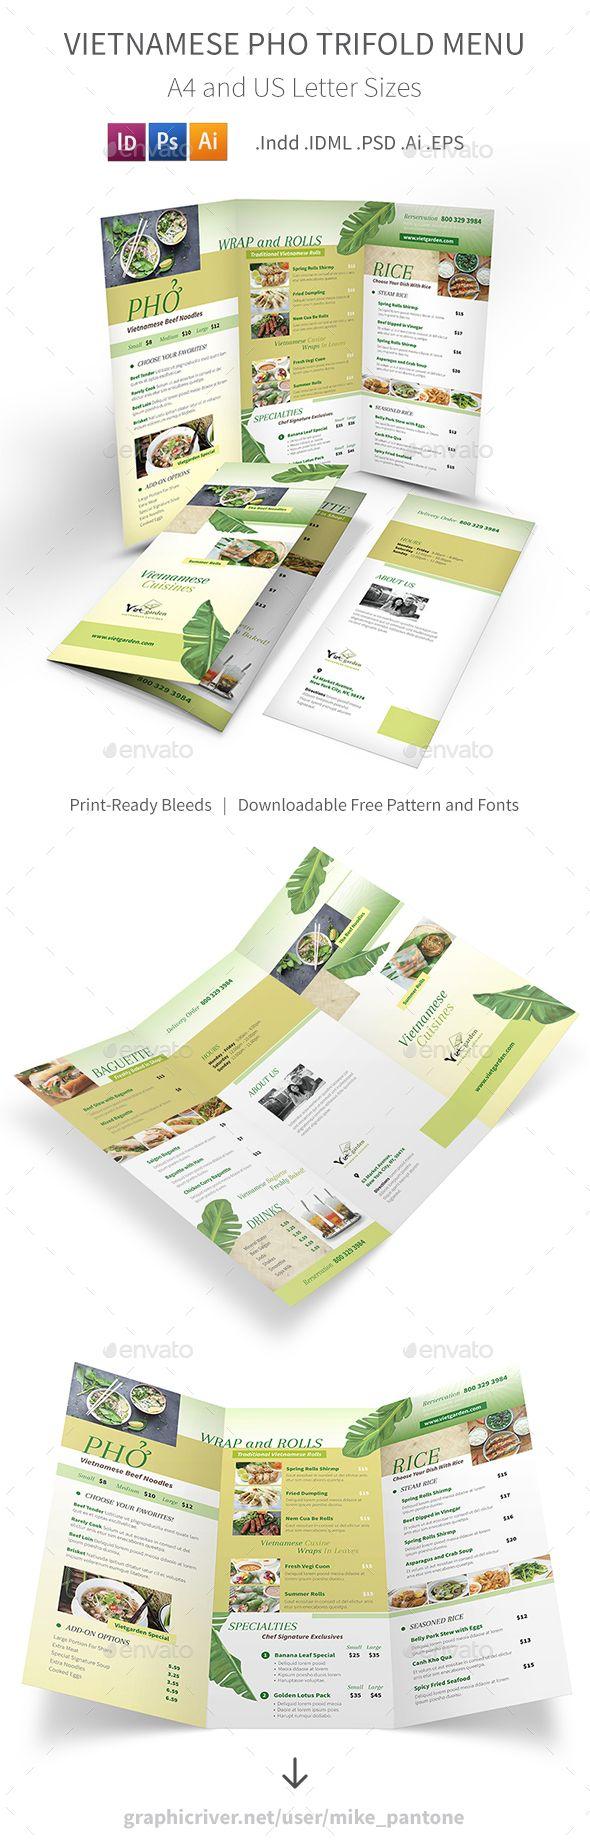 Vietnamese Pho Trifold Menu 3 Food Menus Print Templates